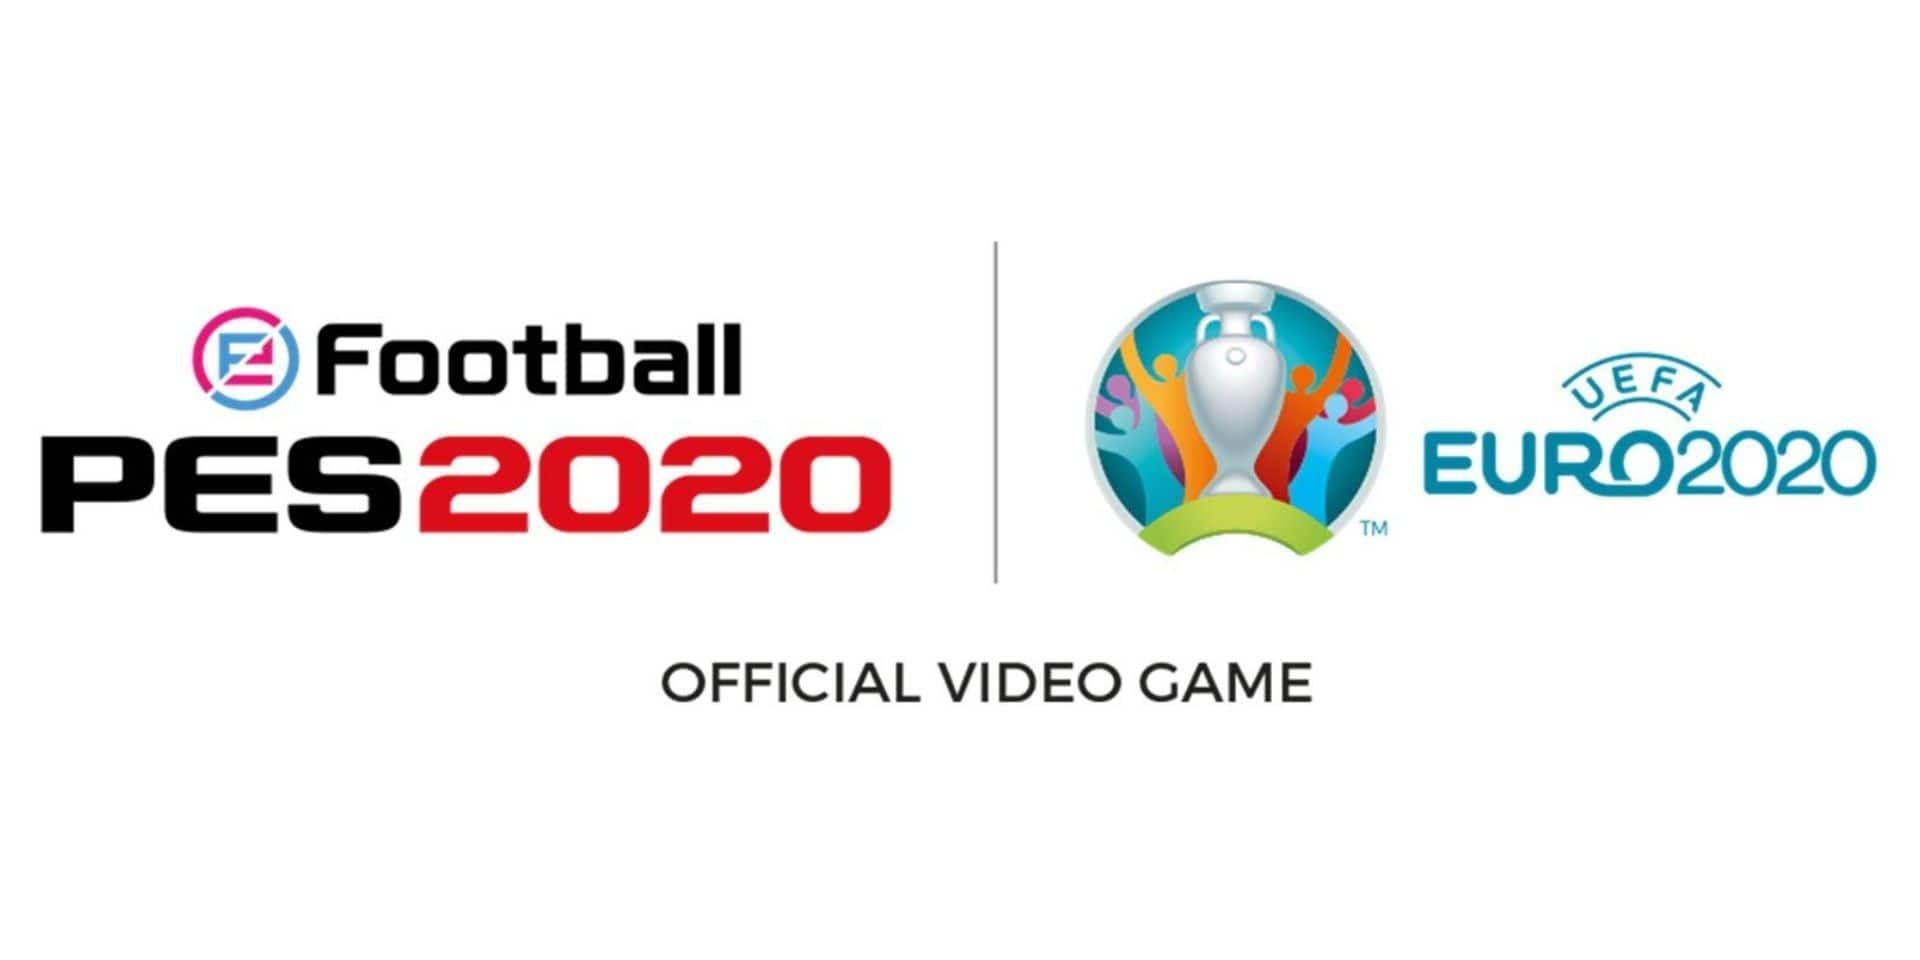 L'eEuro 2020 aura lieu sur PES